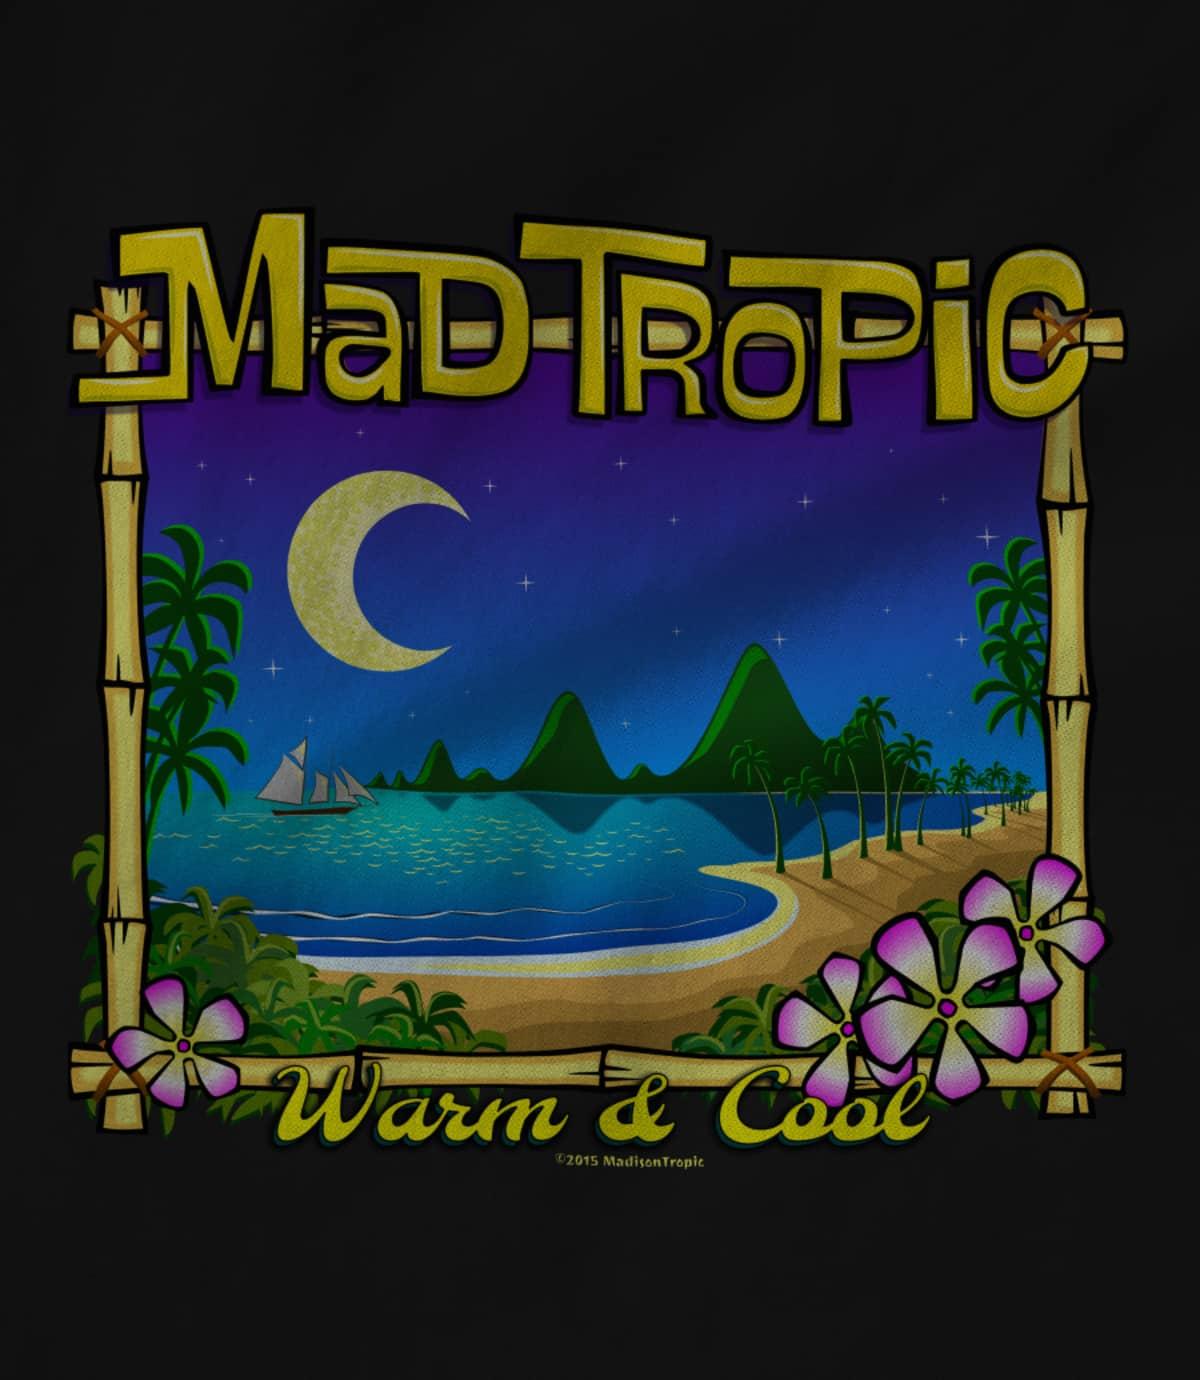 MadTropic